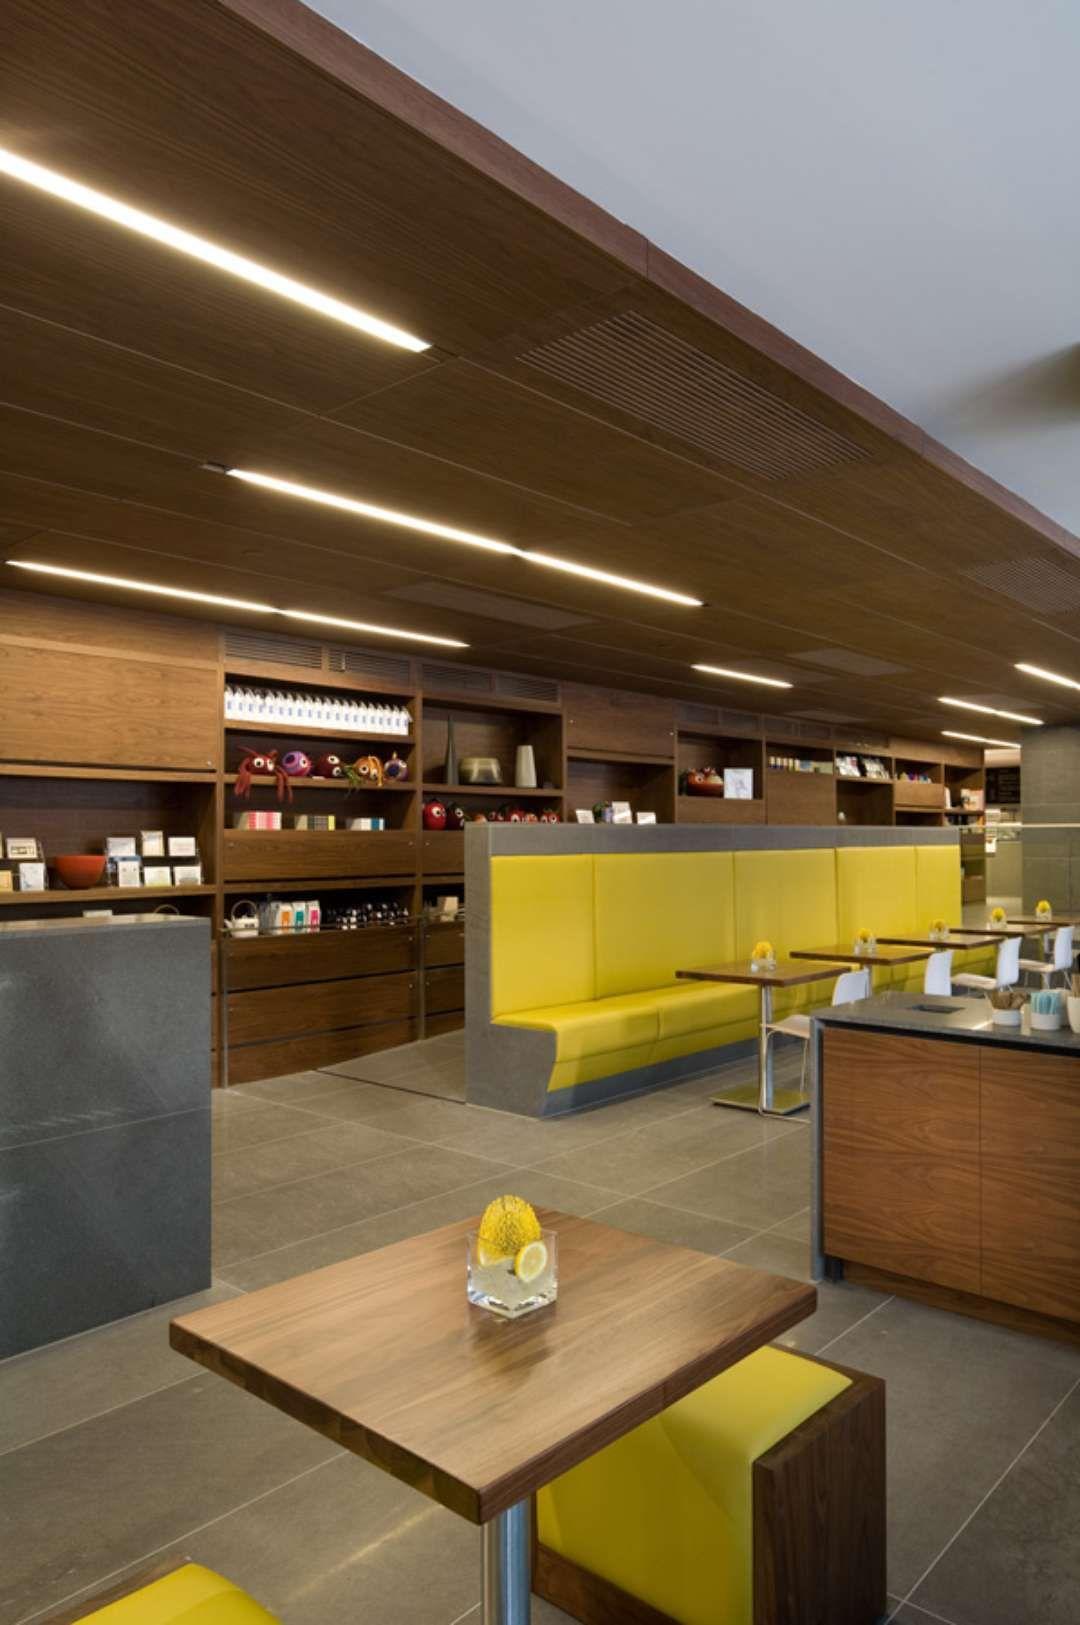 Designed as a splitlevel café, deli and bakery, the name